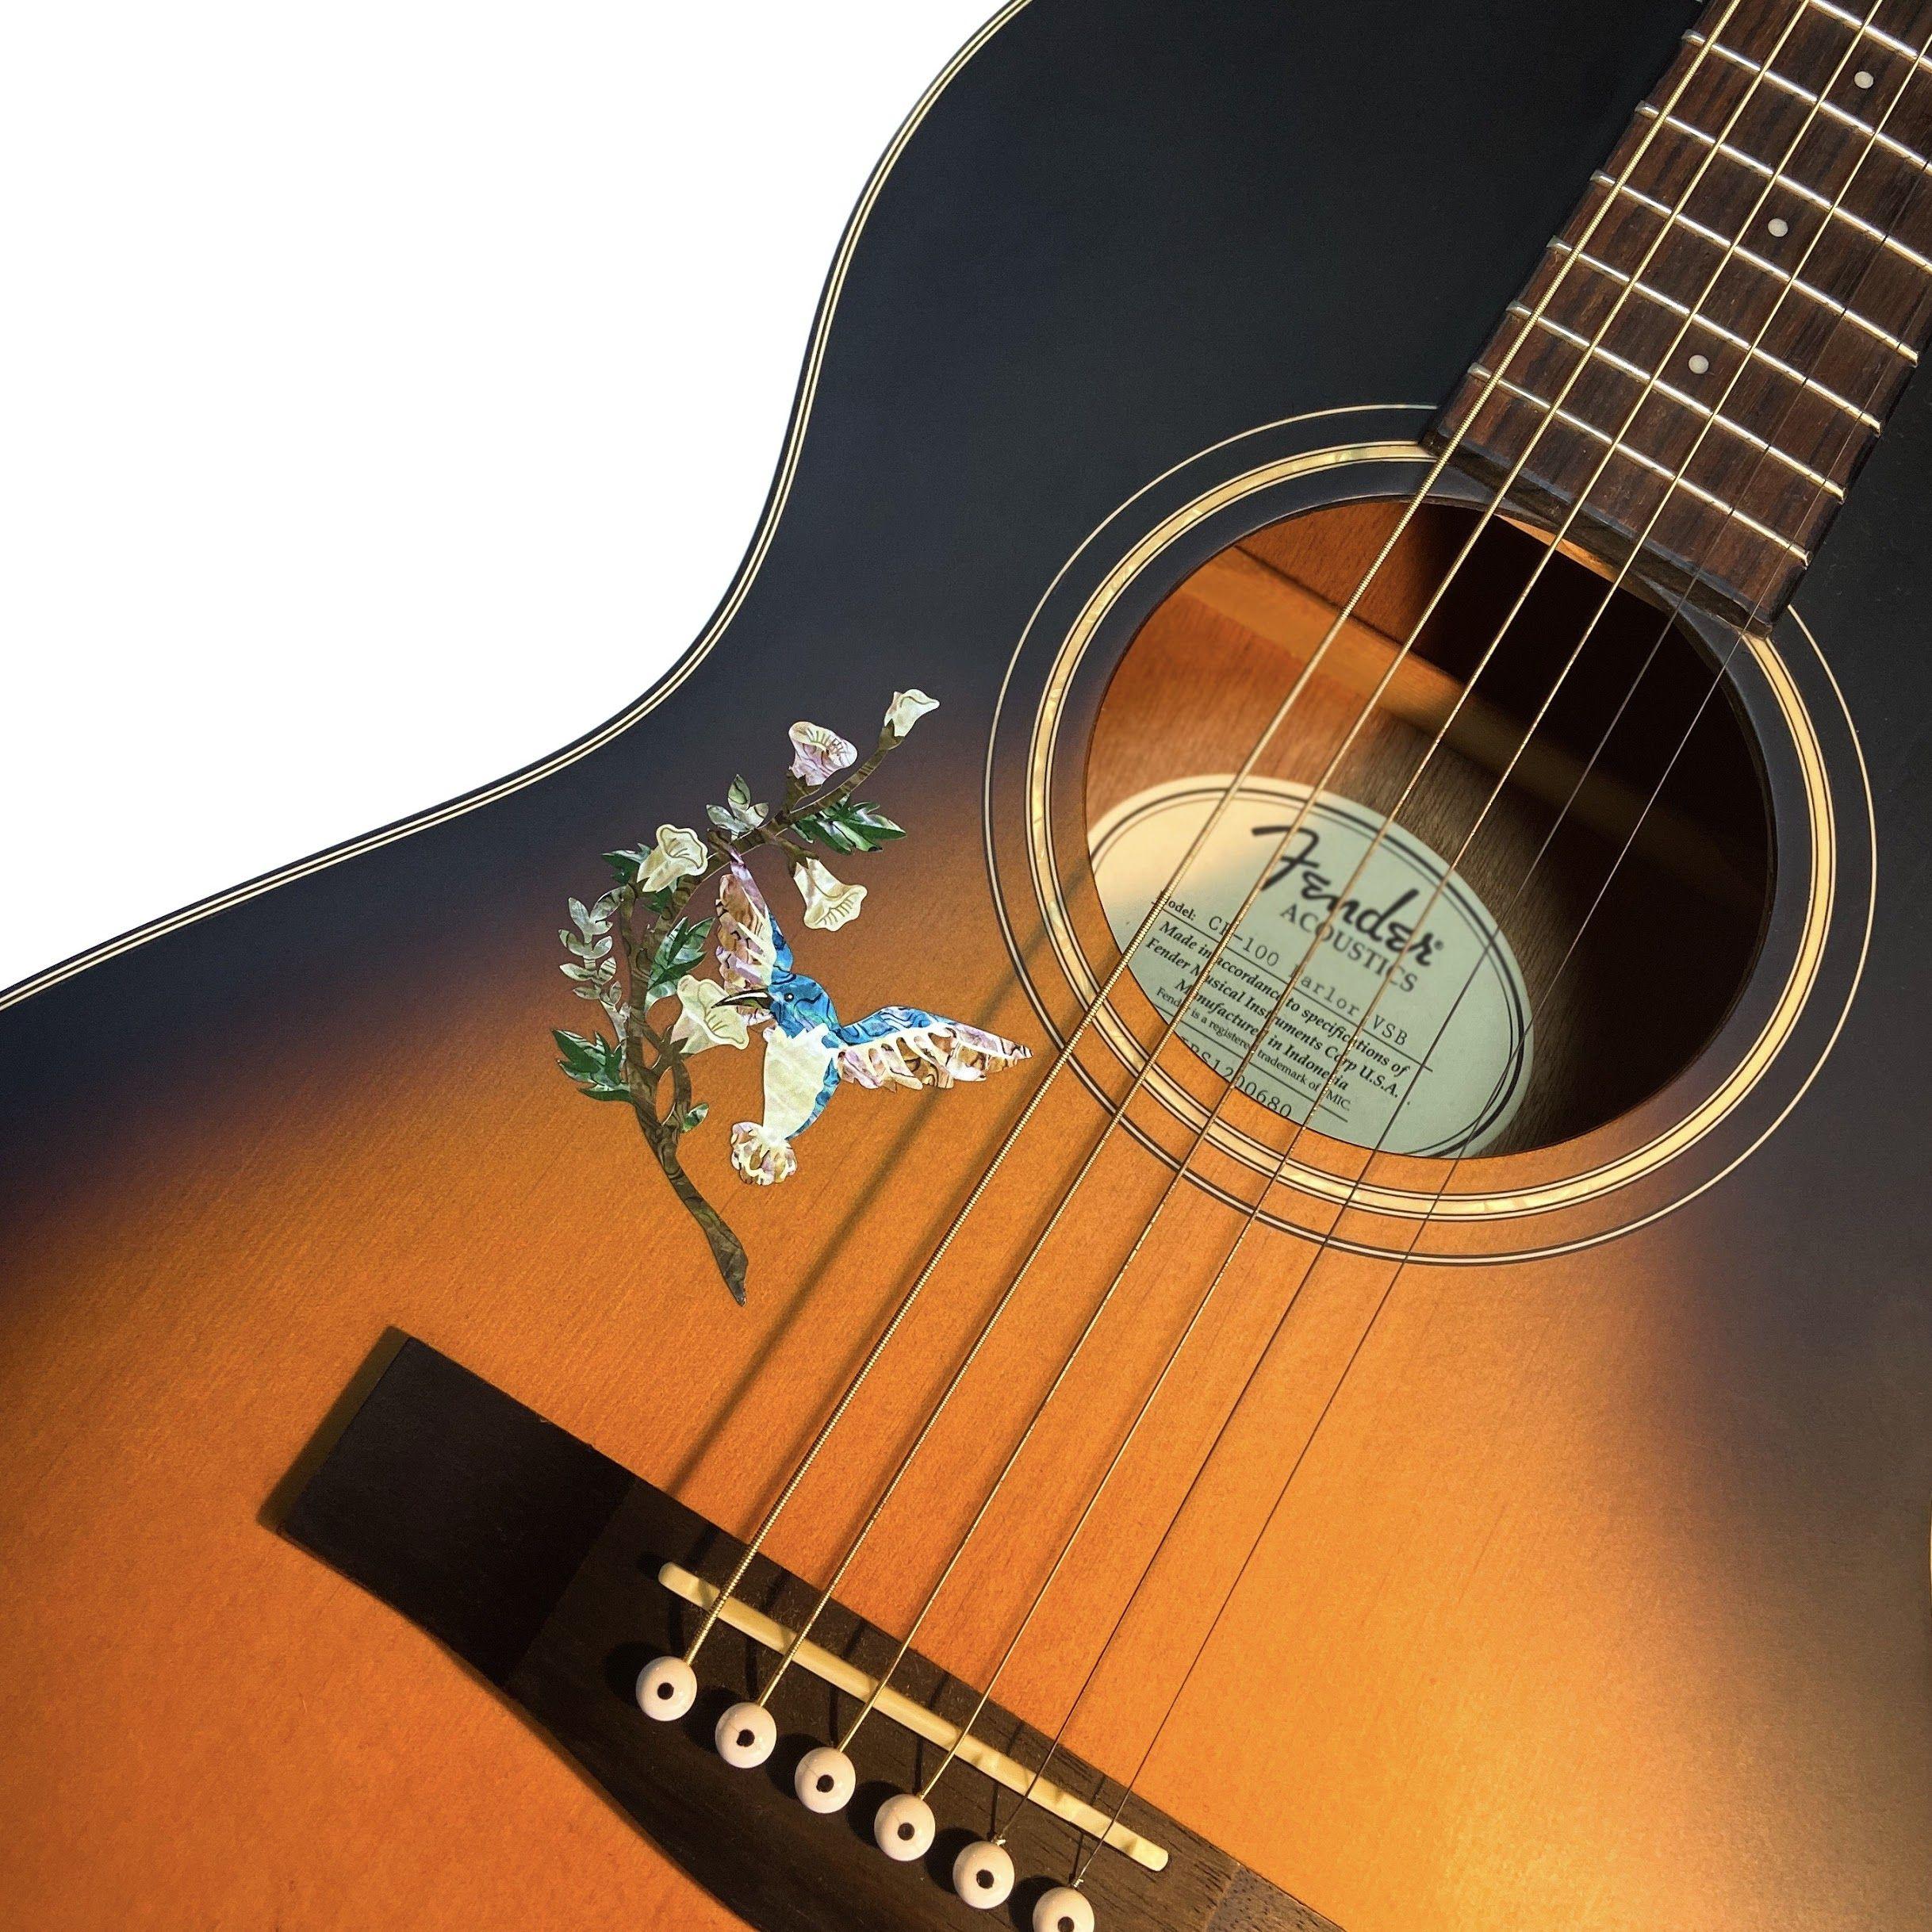 Hummingbird Dx 1 4 Guitar Hummingbird Grace Vanderwaal Ukulele